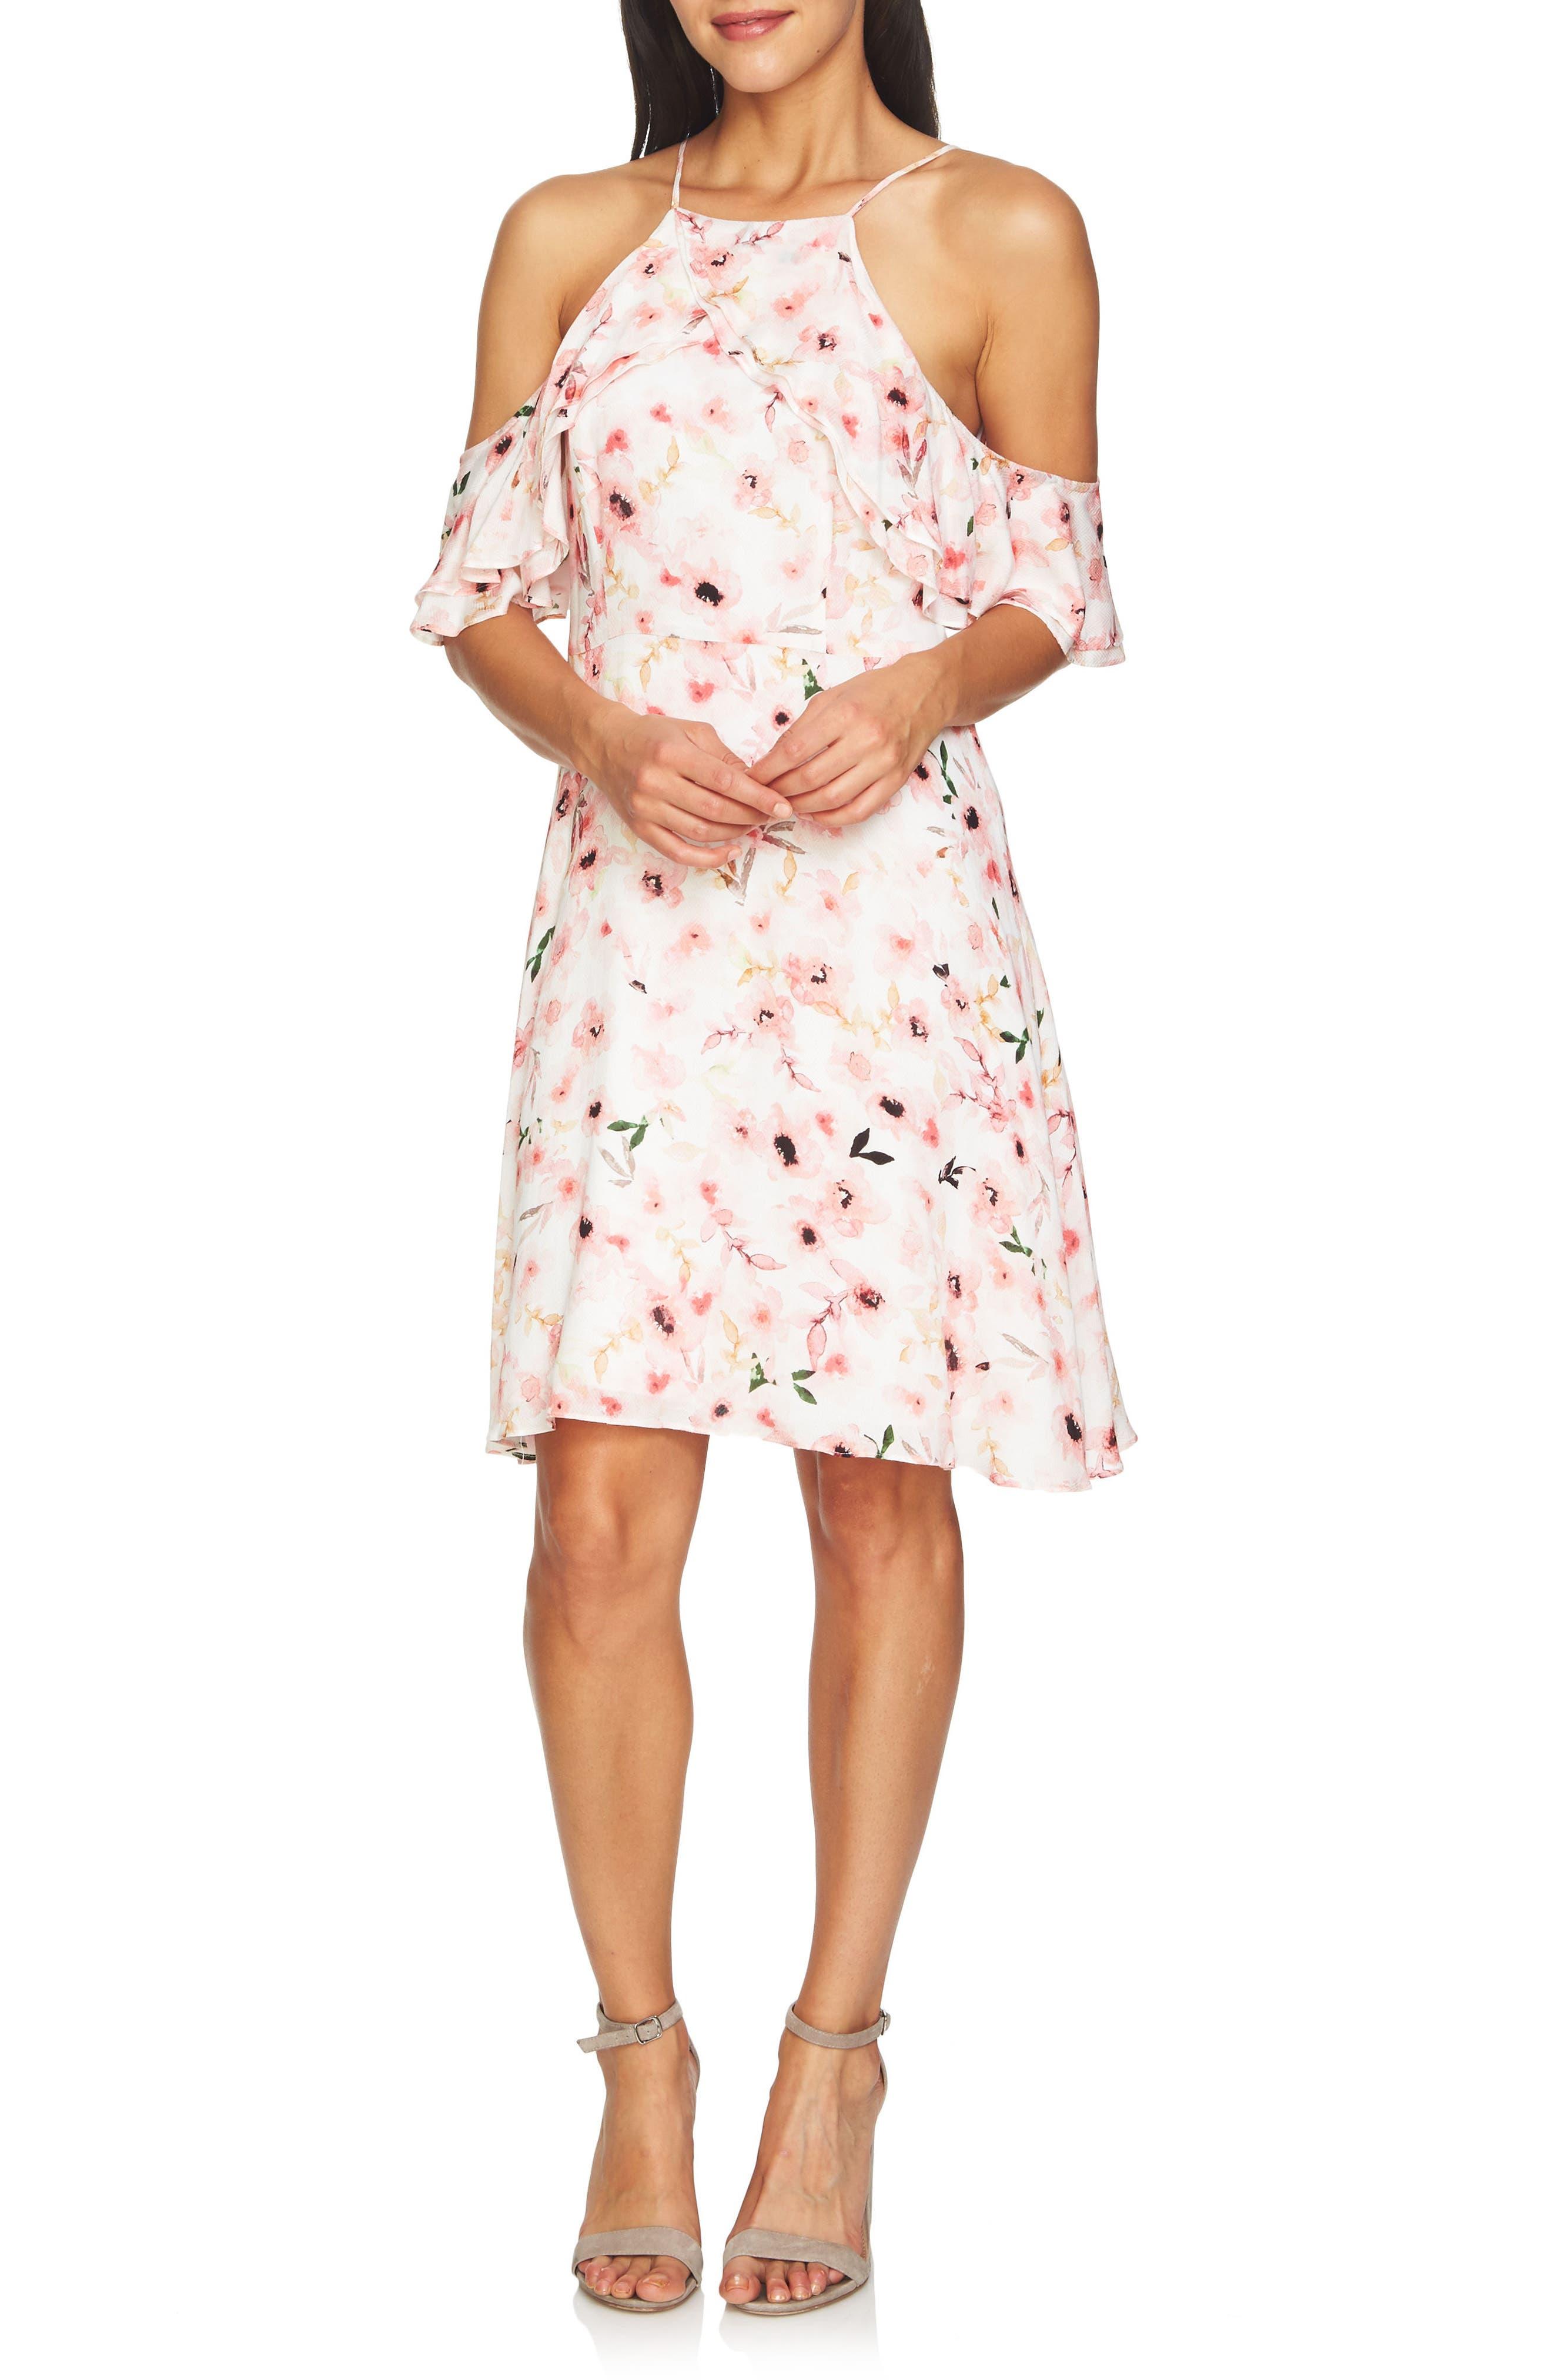 Arden Cold Shoulder Ruffle Dress,                         Main,                         color, 145